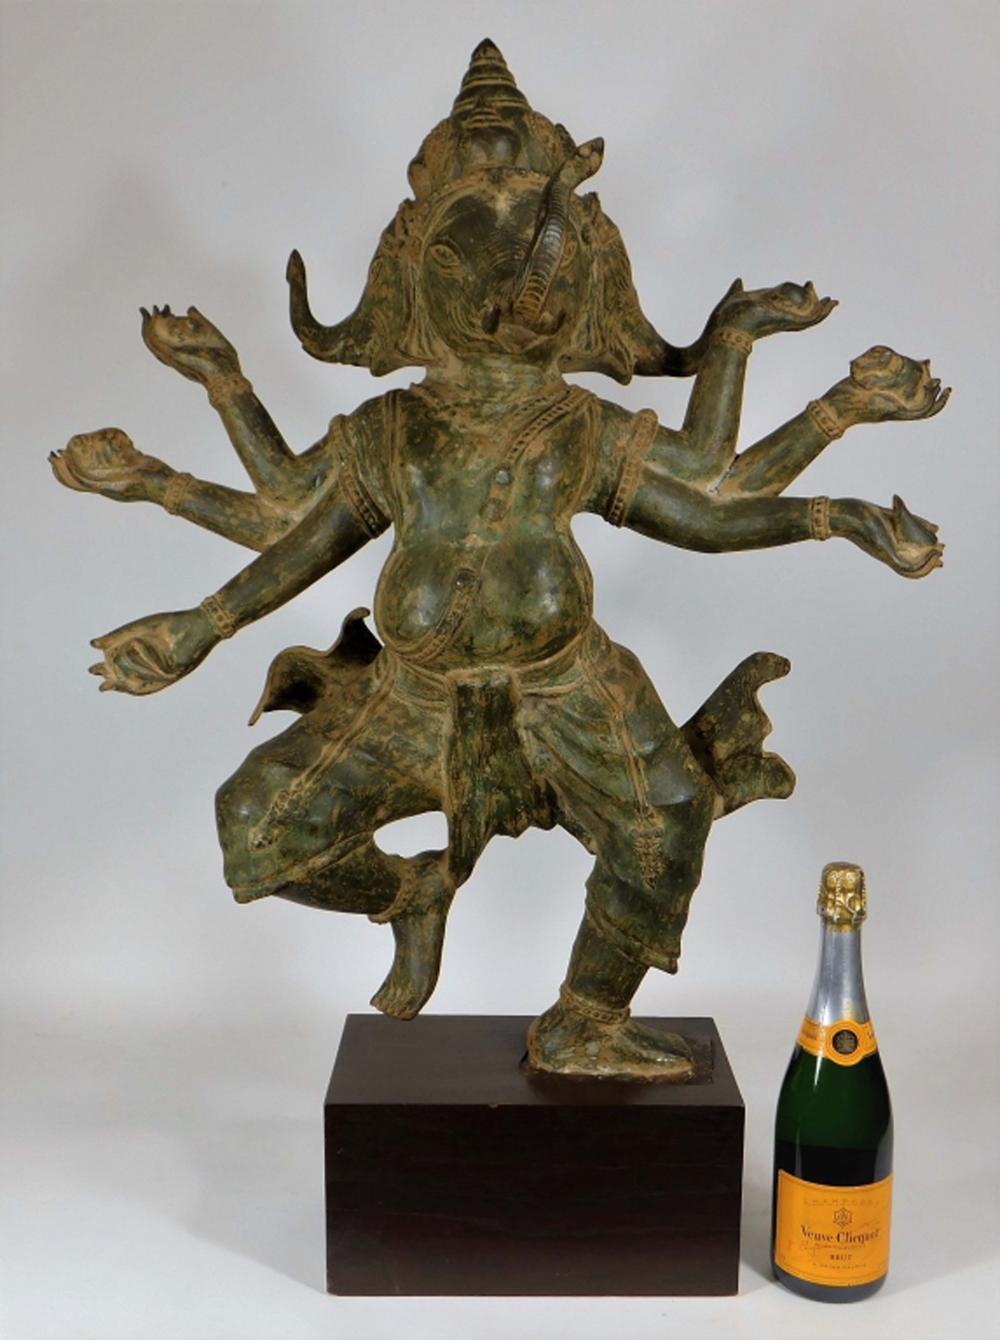 20C Indian Patinated Metal Sculpture of Ganesh